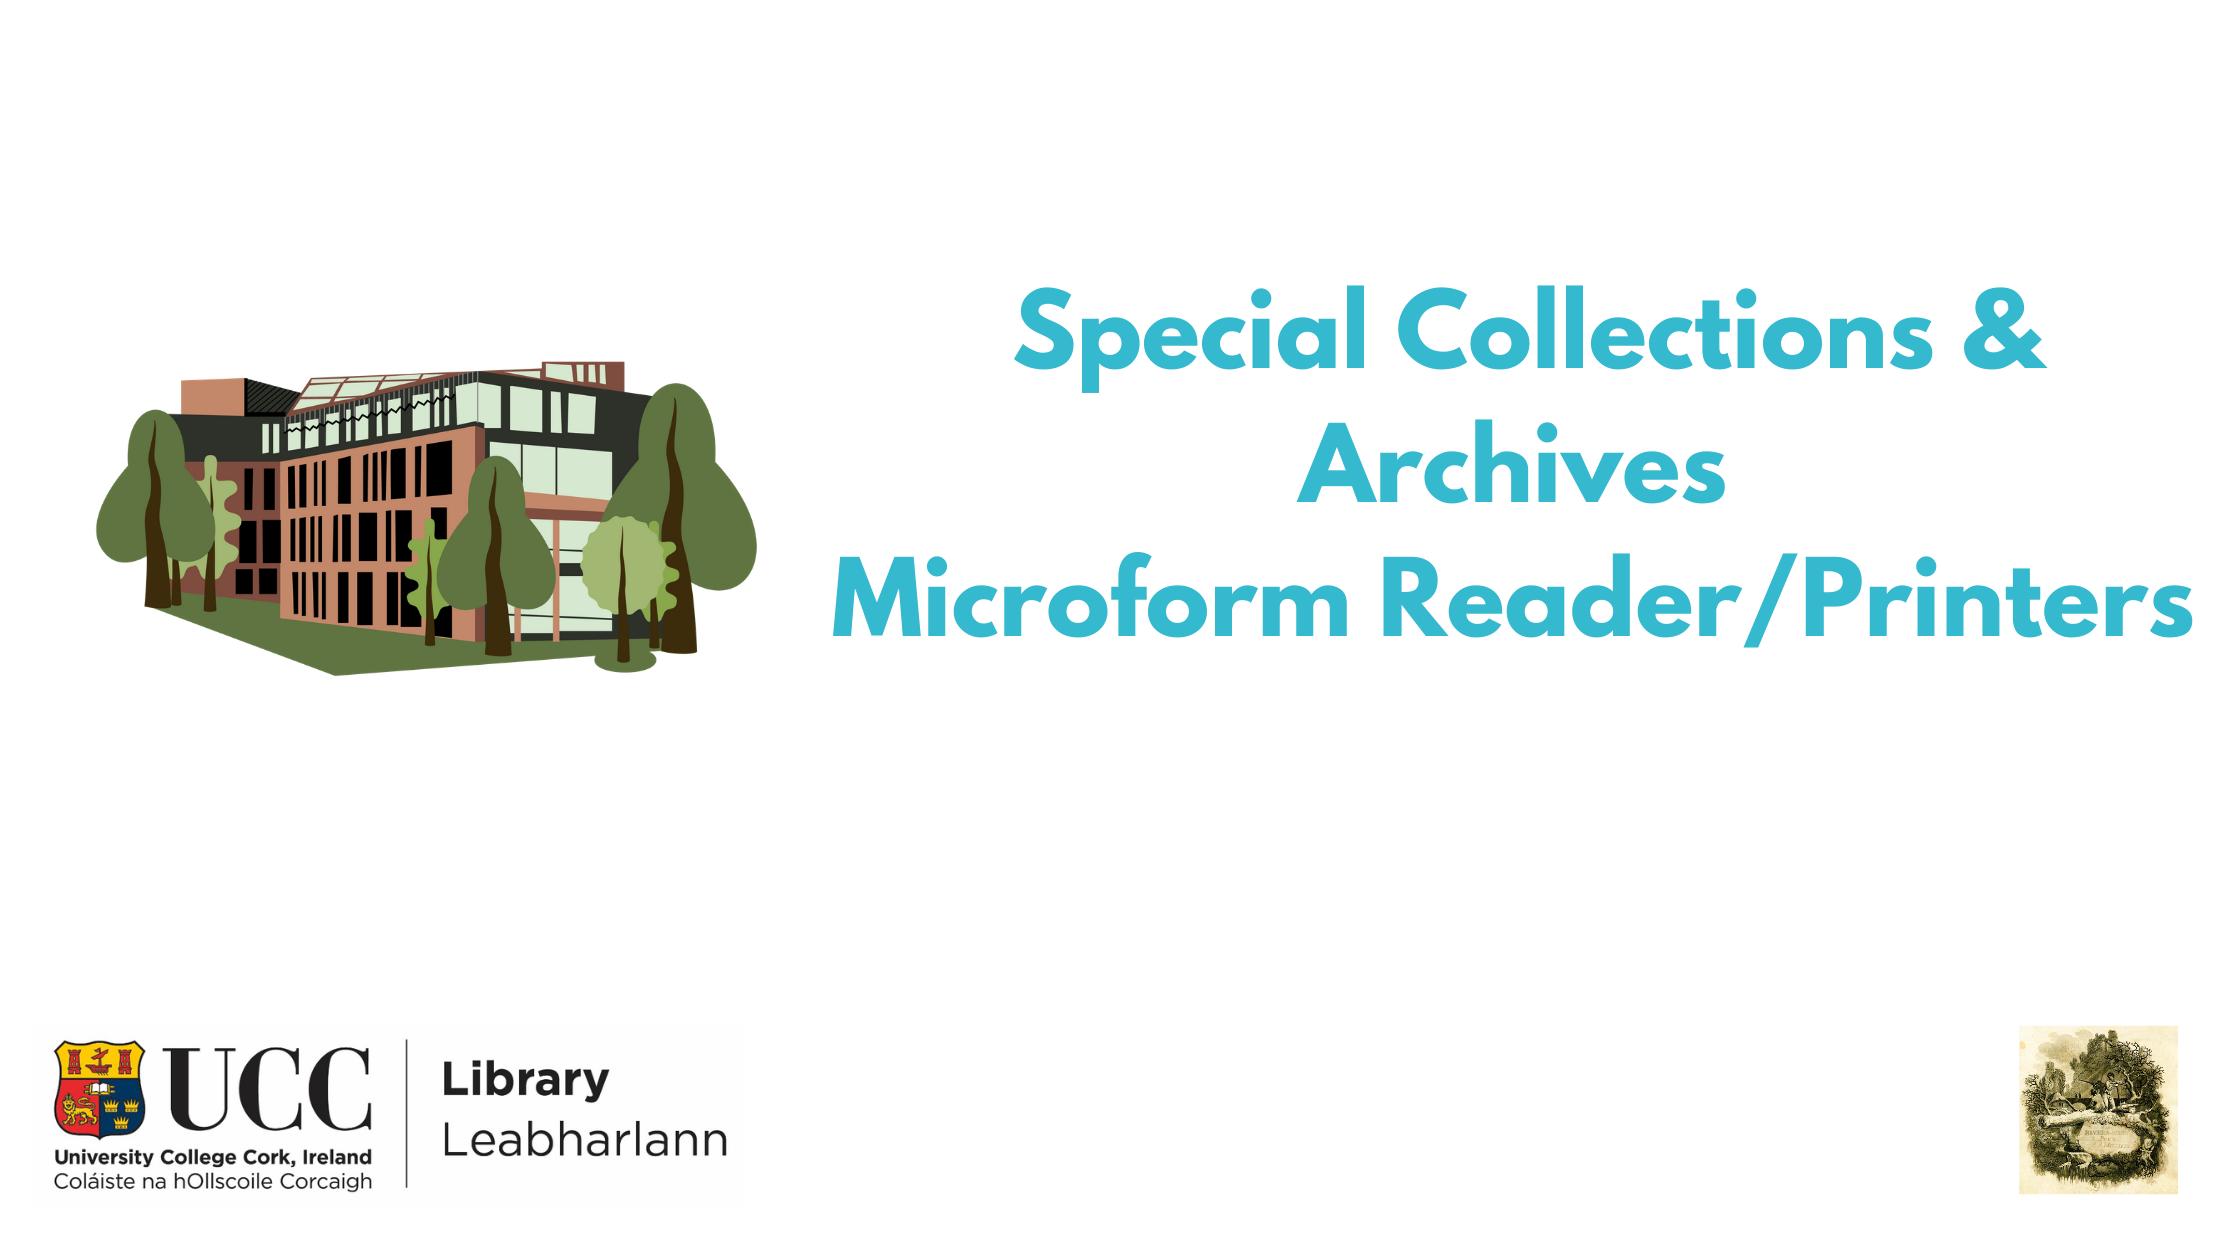 Mircoform Reader/Printer Banner